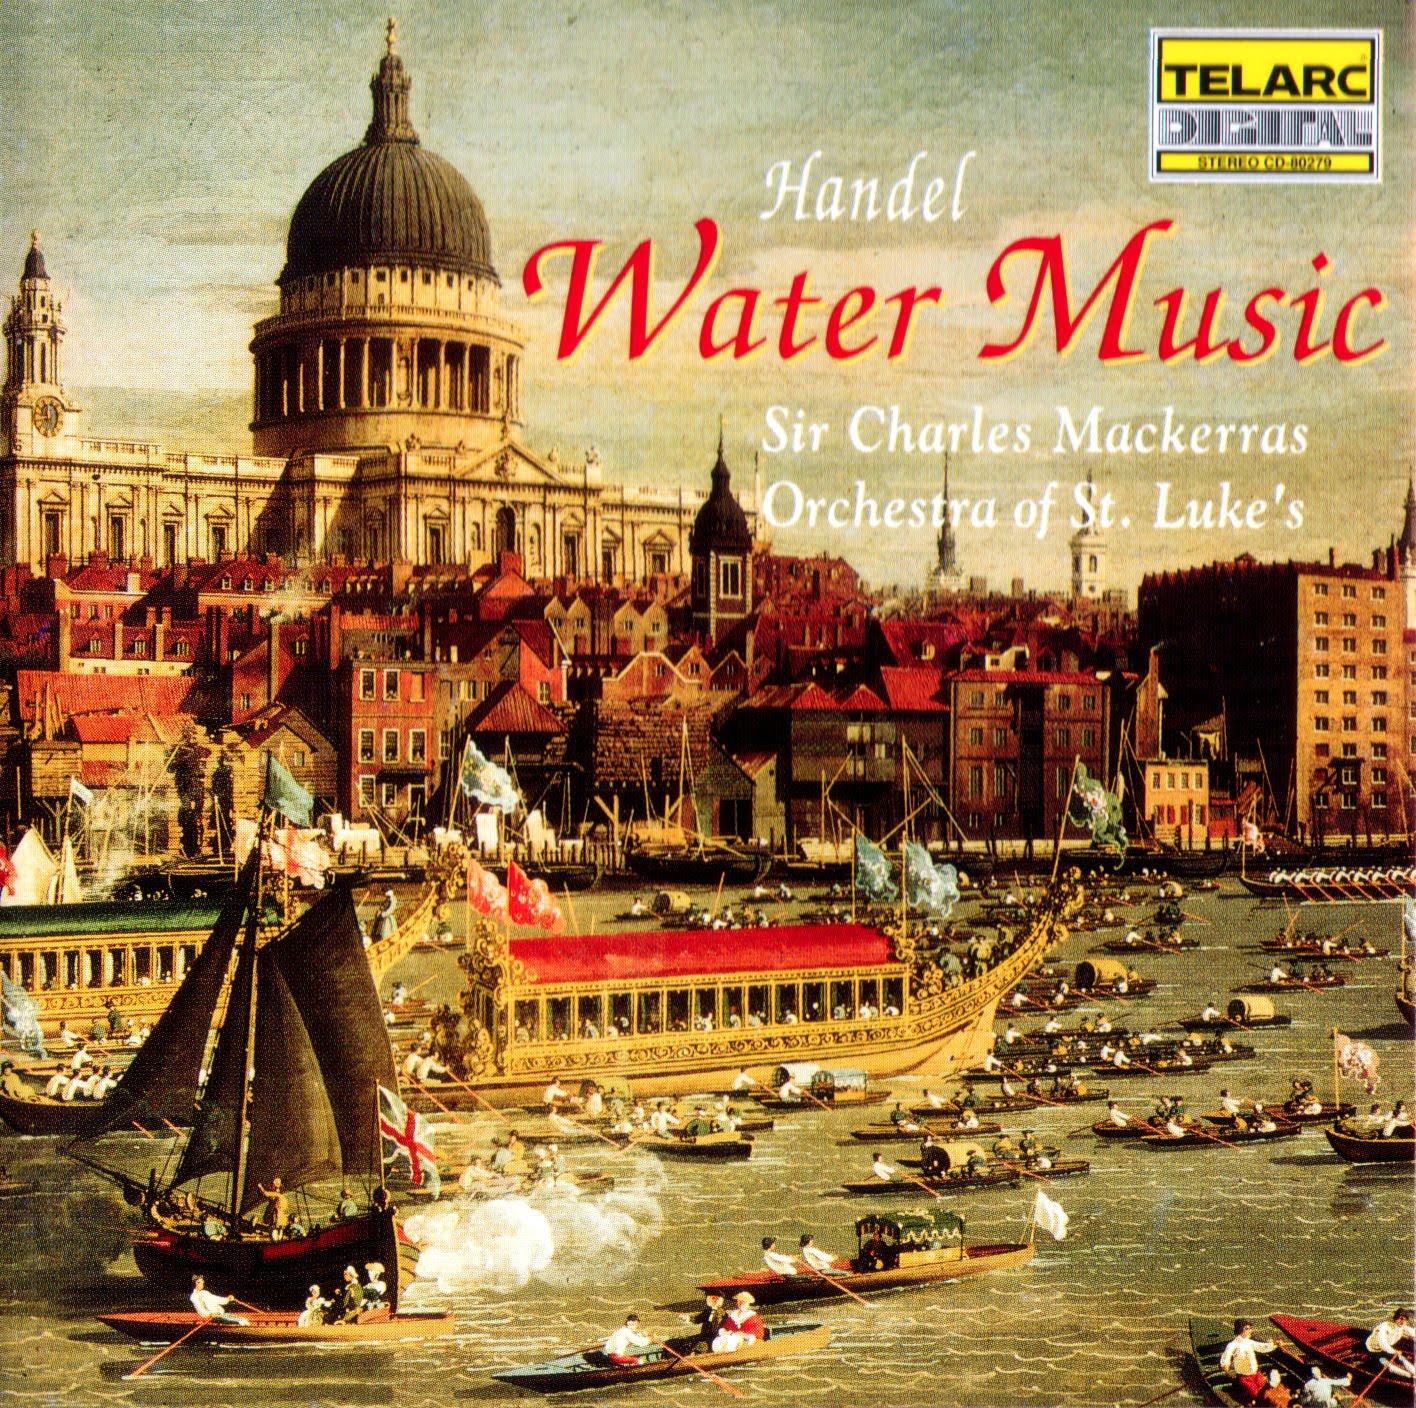 Händel: Water Music - Orchestra of St. Luke\'s, Mackerras - jewish-music